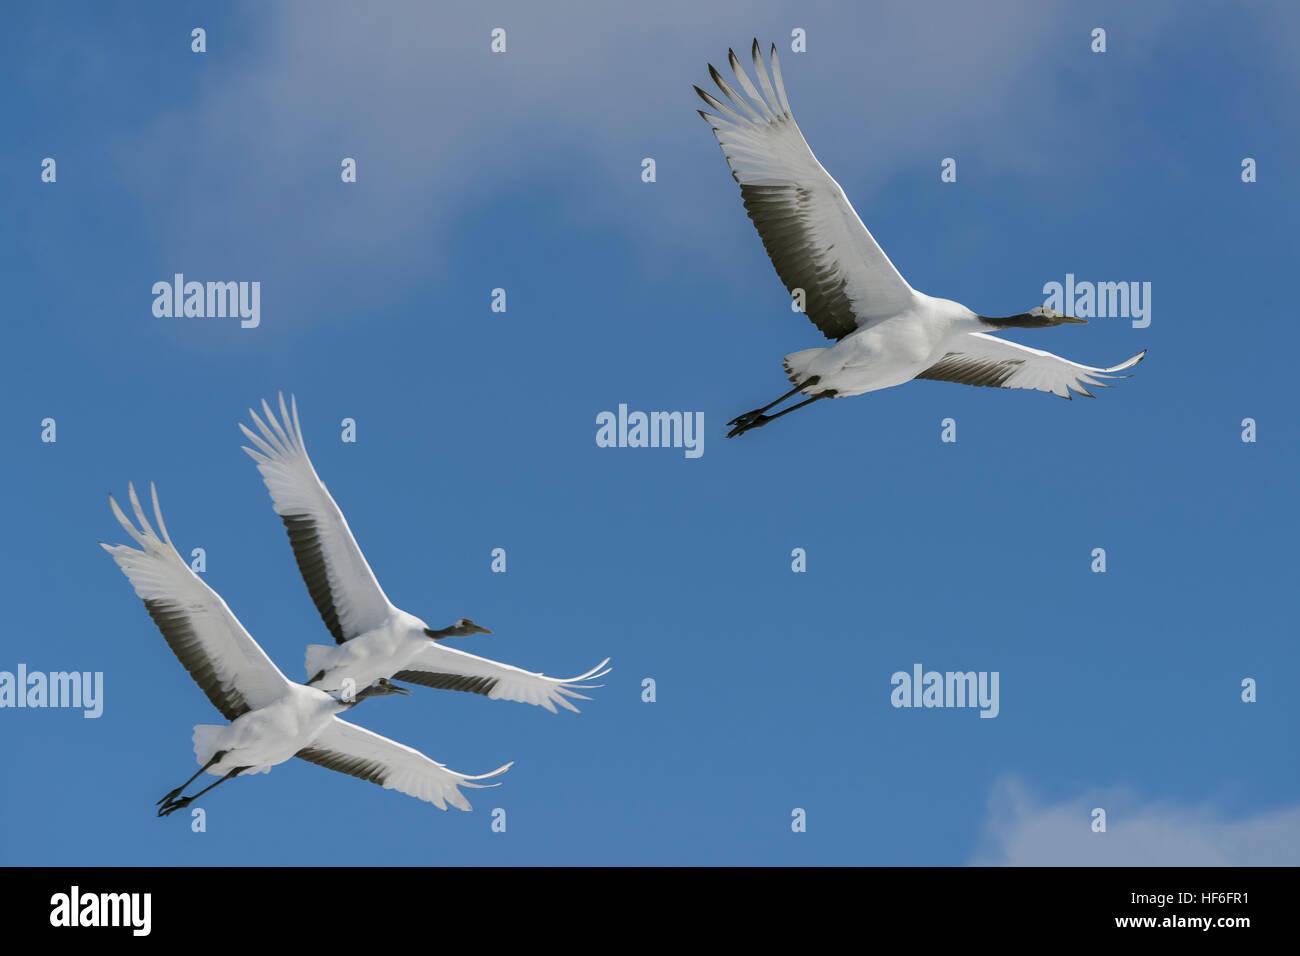 Red-crowned cranes in flight near Tsurui Ito Tancho Crane Sanctuary, Hokkaido, Japan - Stock Image